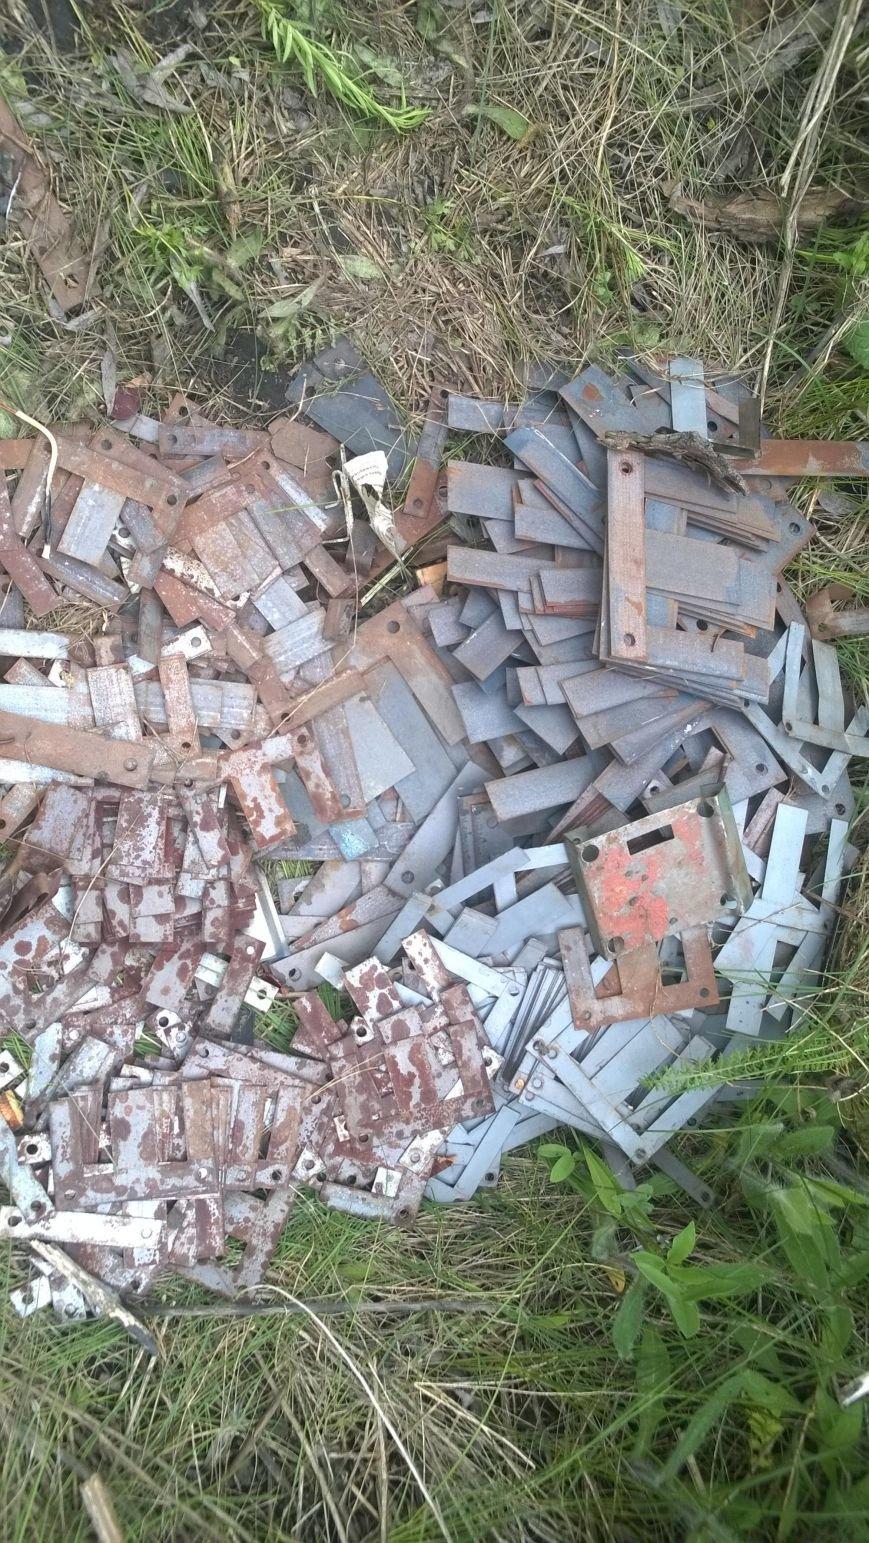 Молодой комсомольчанин разобрал железную дорогу на металлолом (ФОТО), фото-5